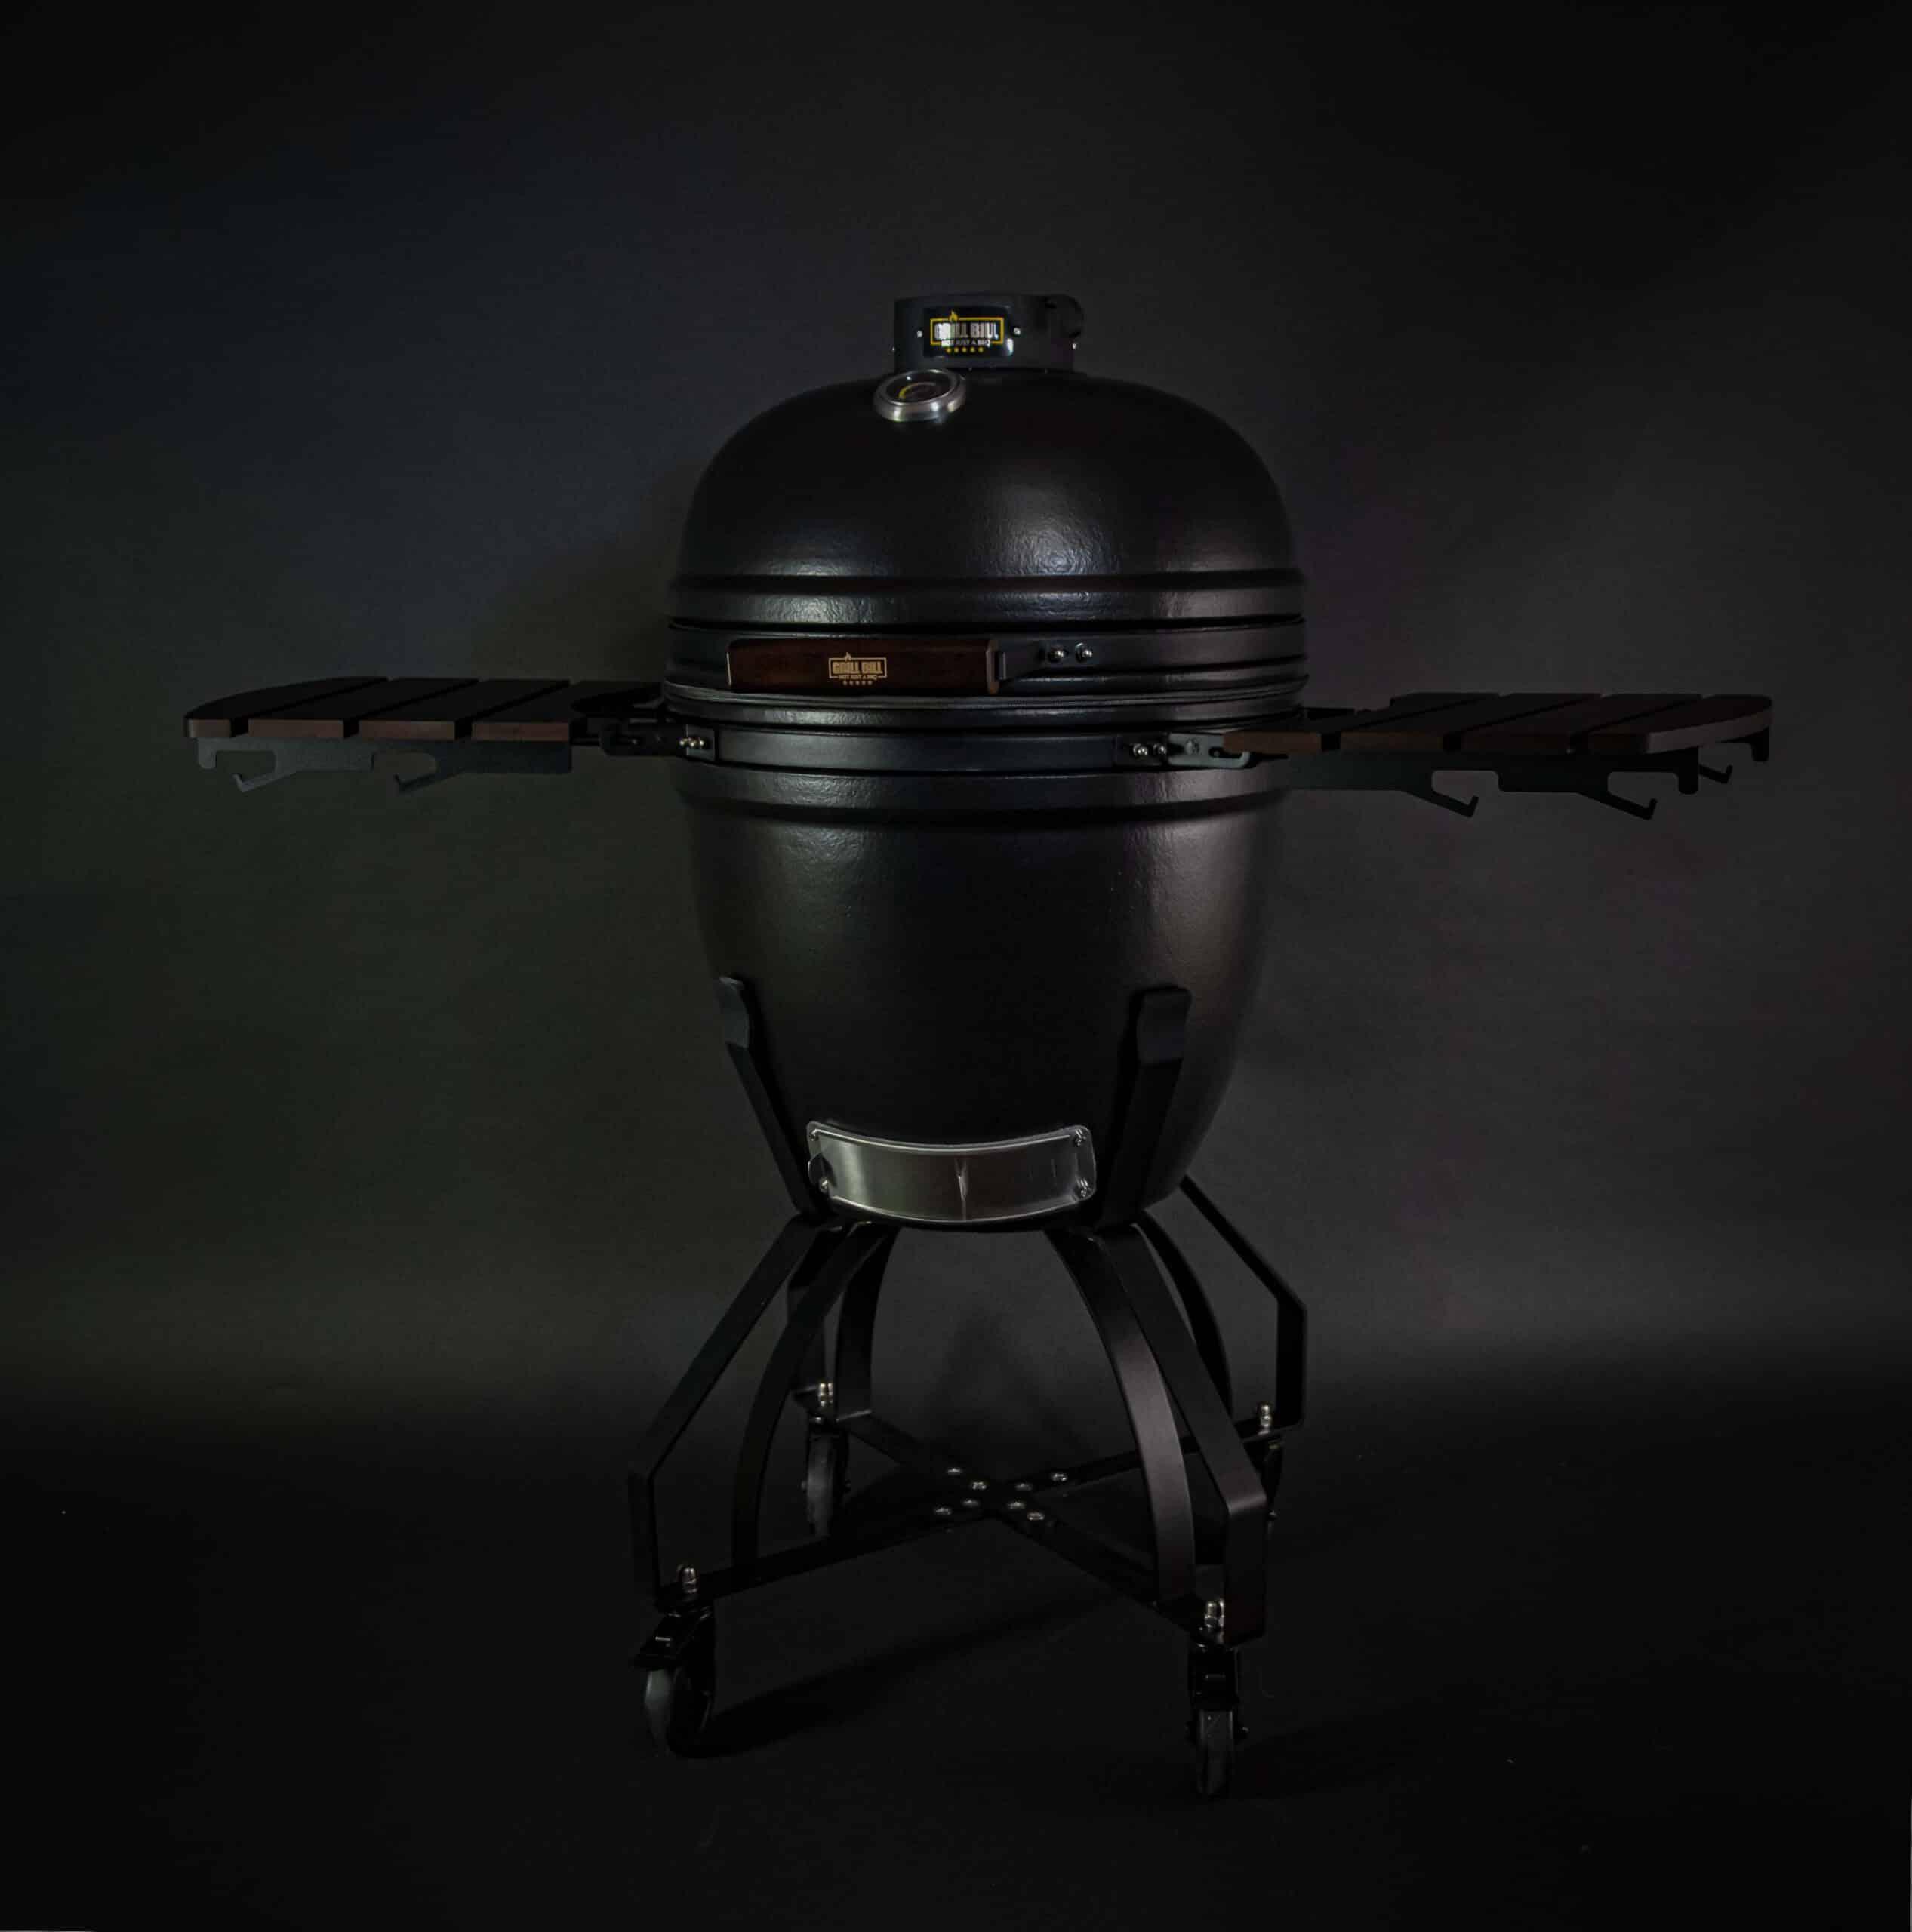 kamado bbq large grill bill pro 21 inch side